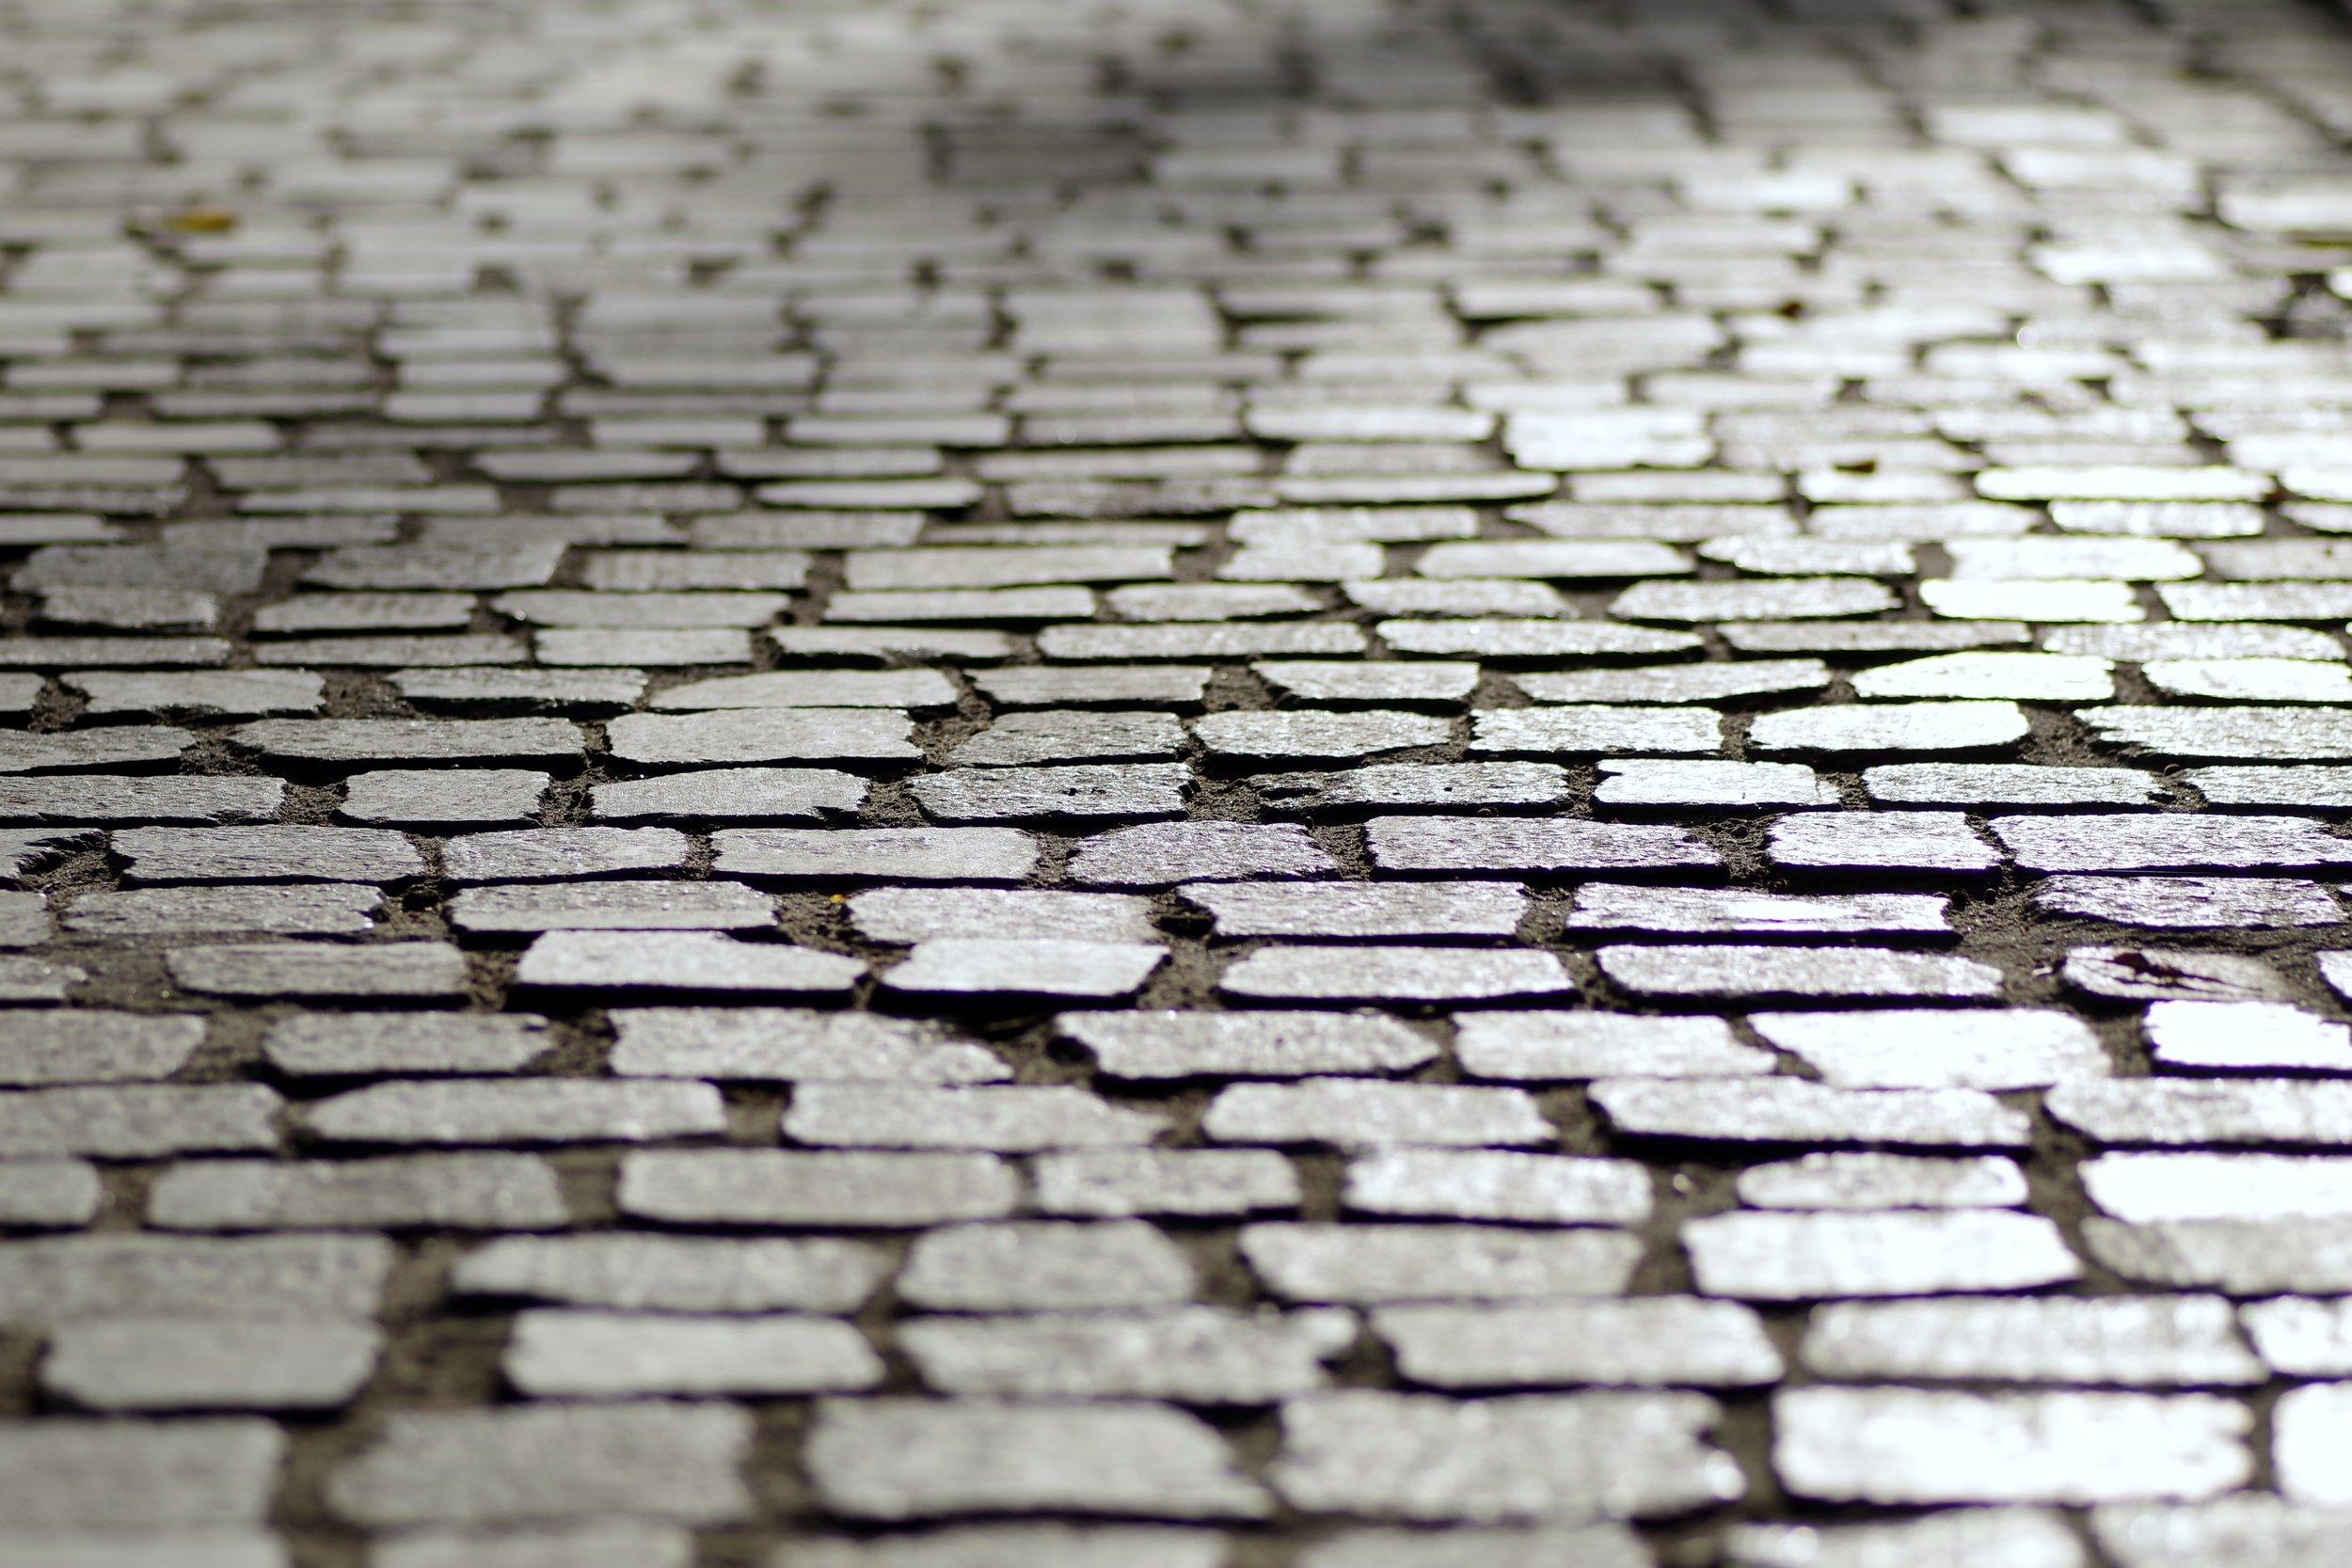 Green, porous, cool sidewalk pavers